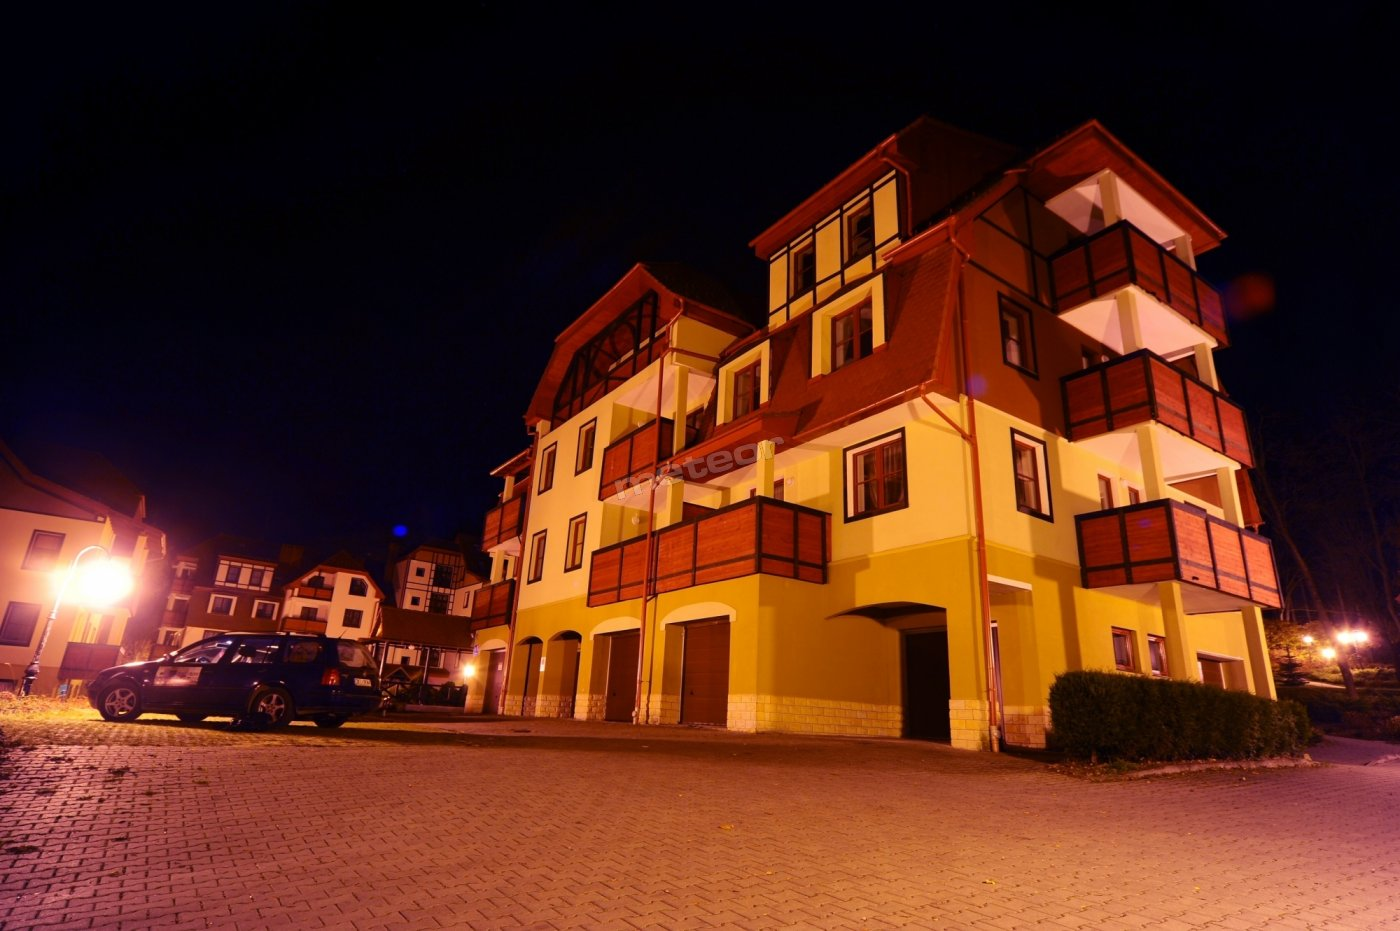 Apartament Na 5 - Noclegi Polanica-Zdrój